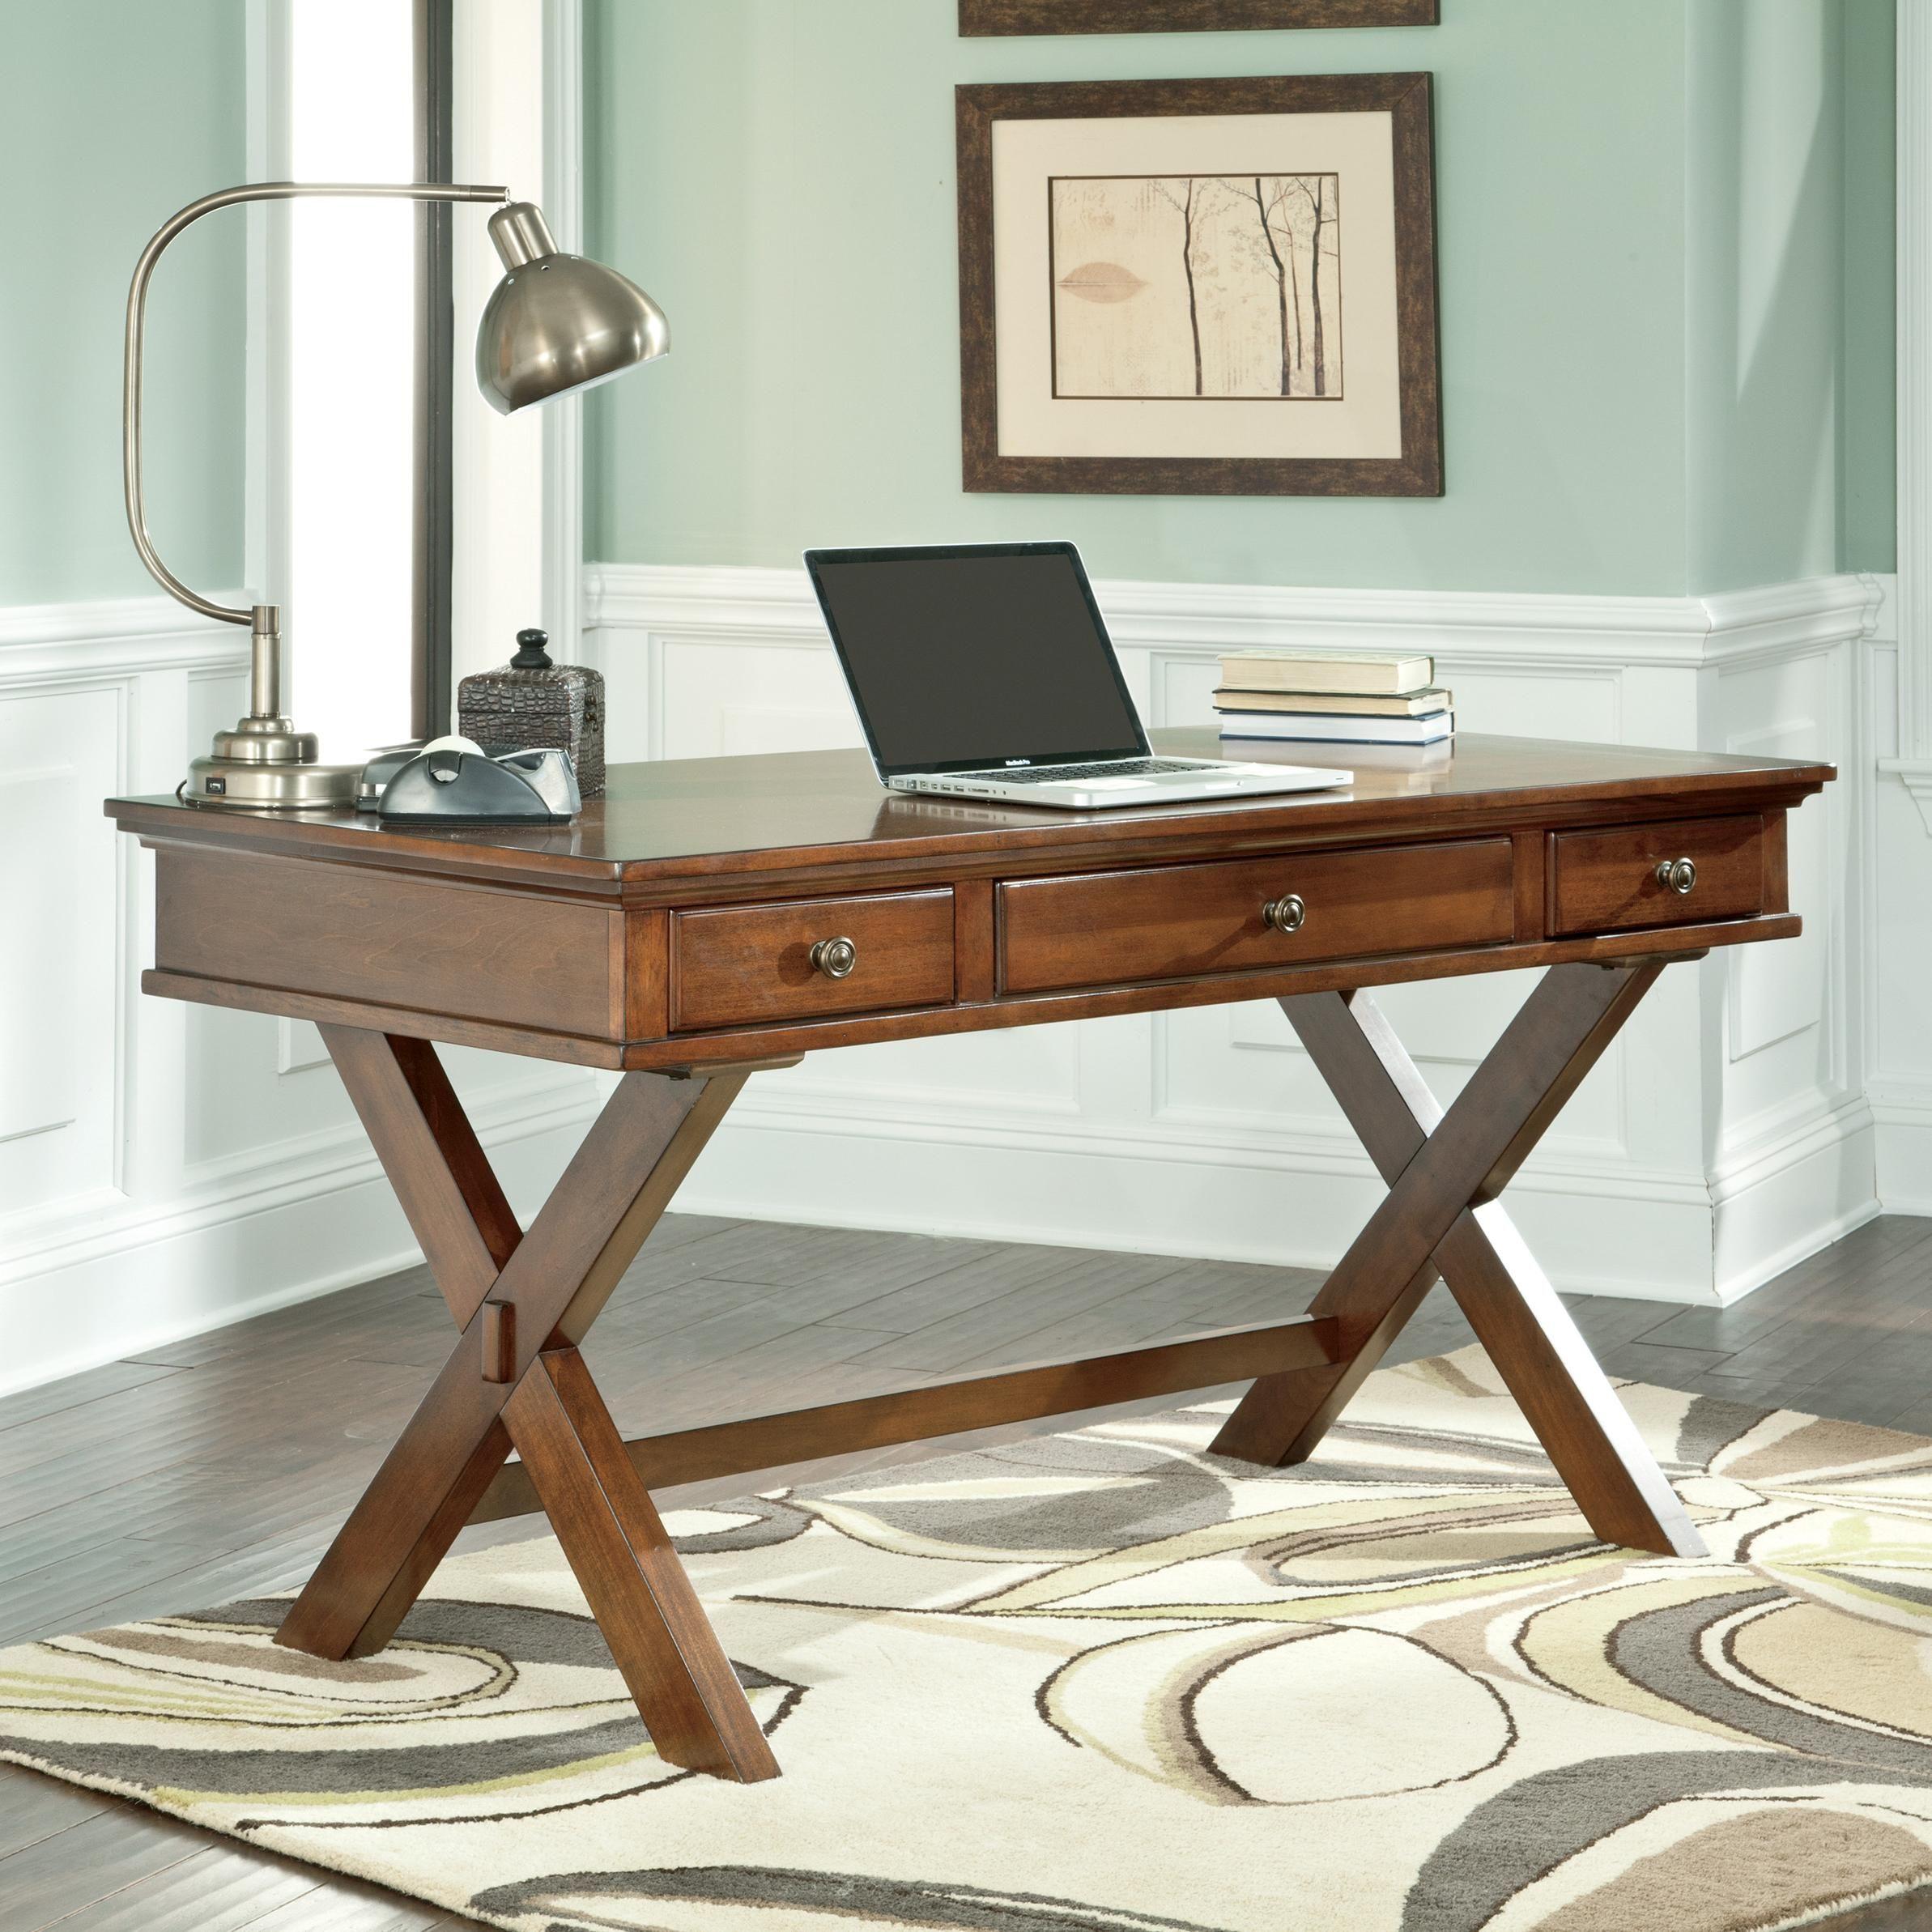 burkesville home office desk by signature design by ashley office rh pinterest com Signature Wooden Furniture signature design office furniture